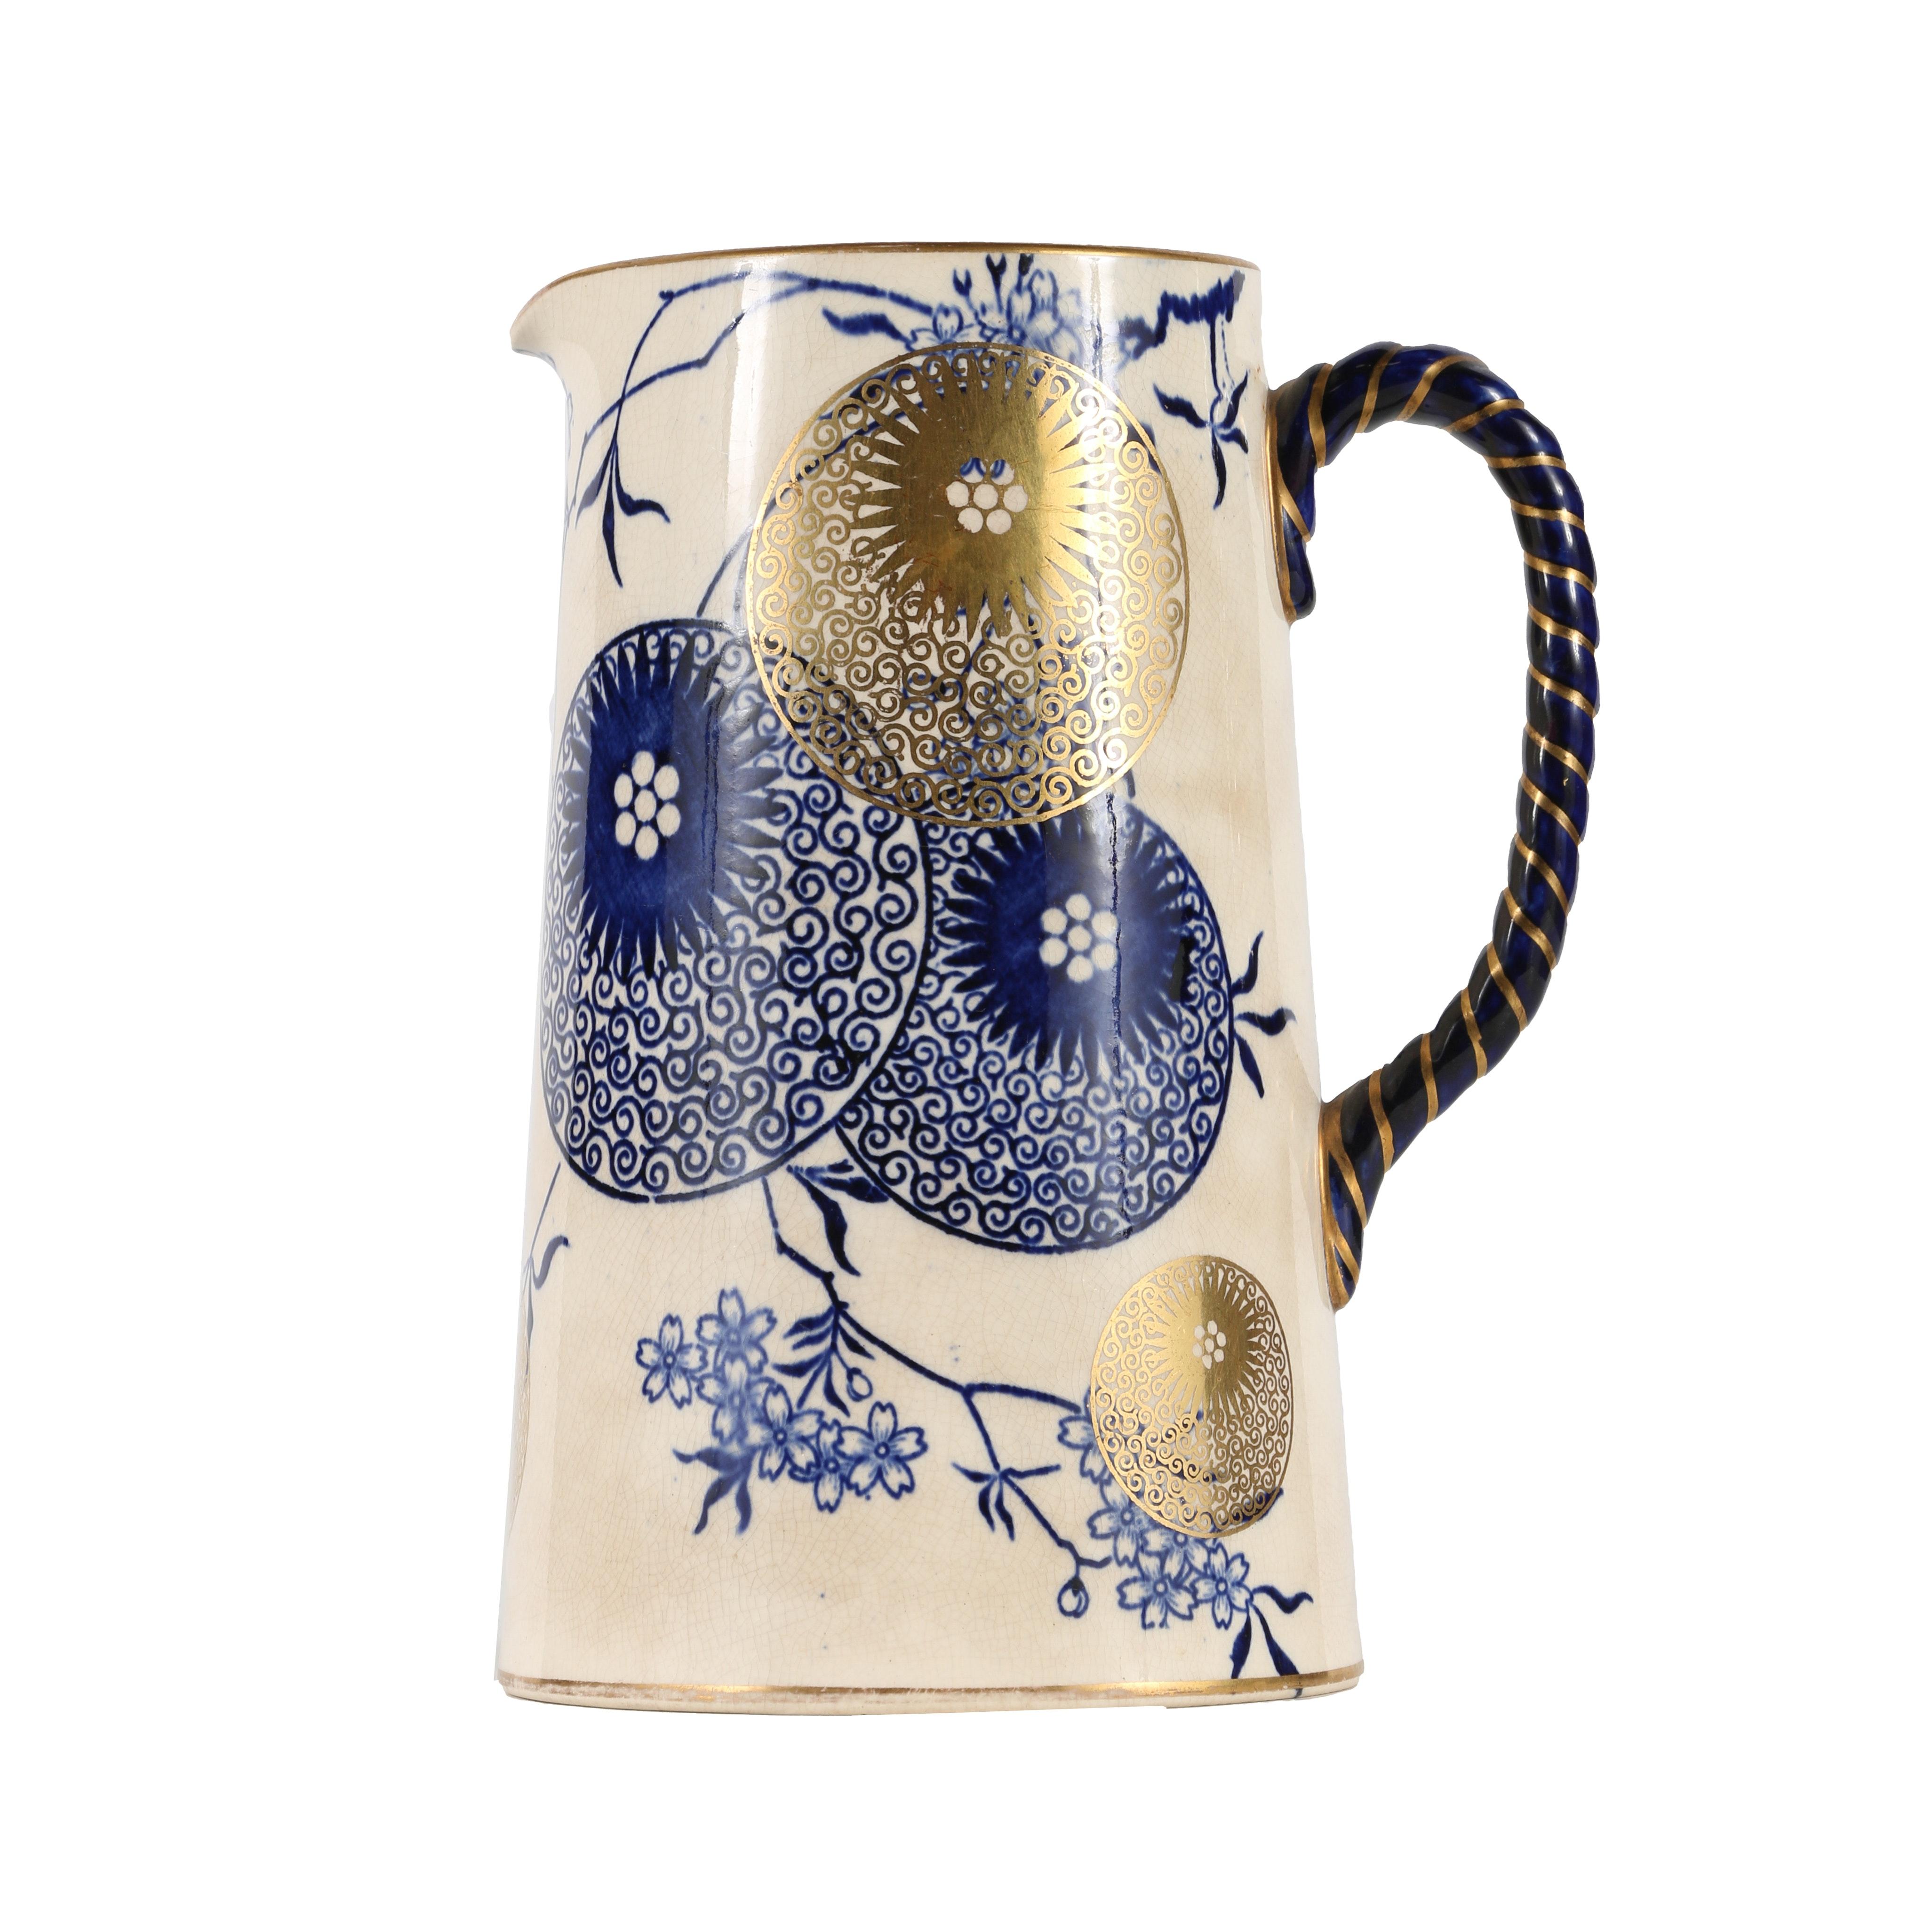 Japanese Ceramic Water Pitcher